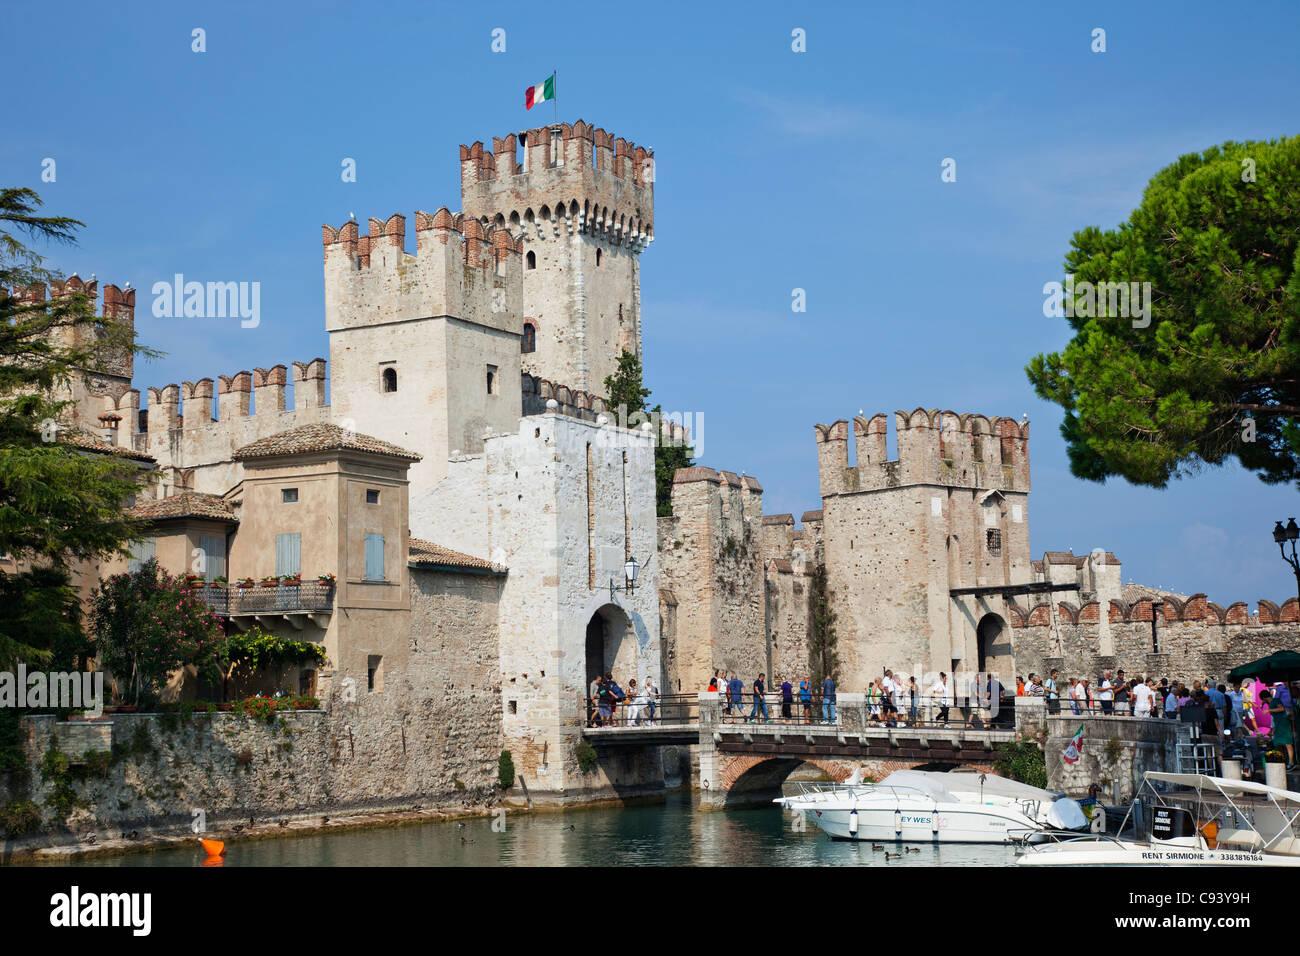 Italy, Lombardy, Lake Garda, Sirmione, Sirmione Castle - Stock Image